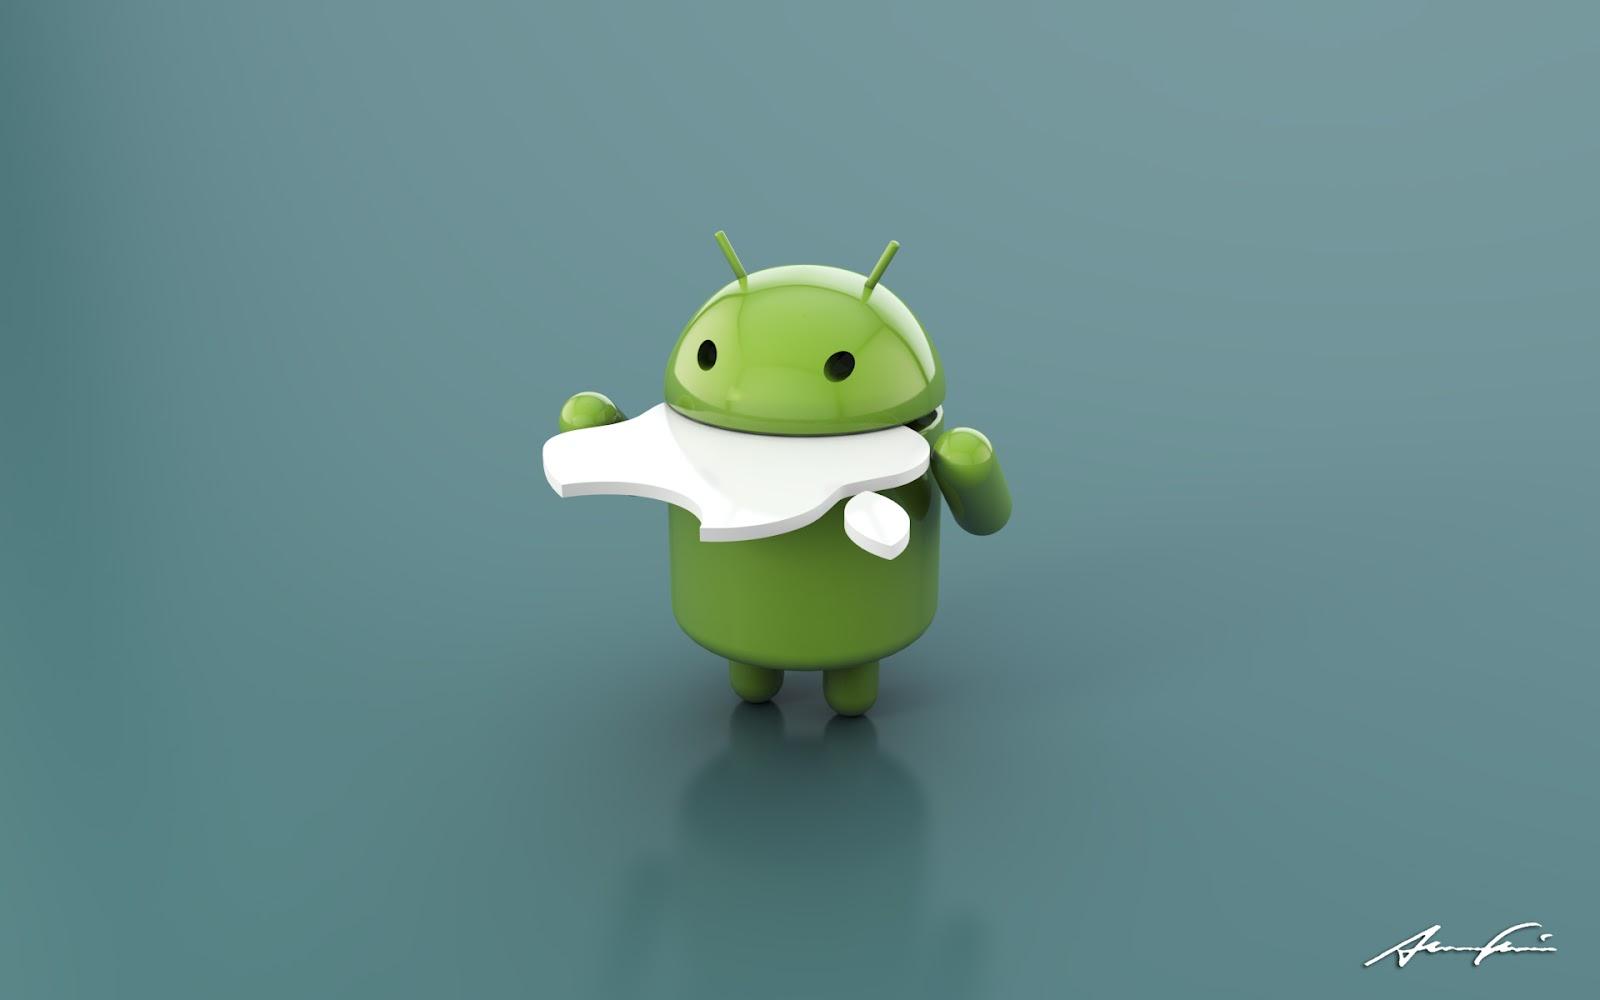 hd android wallpapers hd android wallpapers hd android wallpapers hd 1600x1000